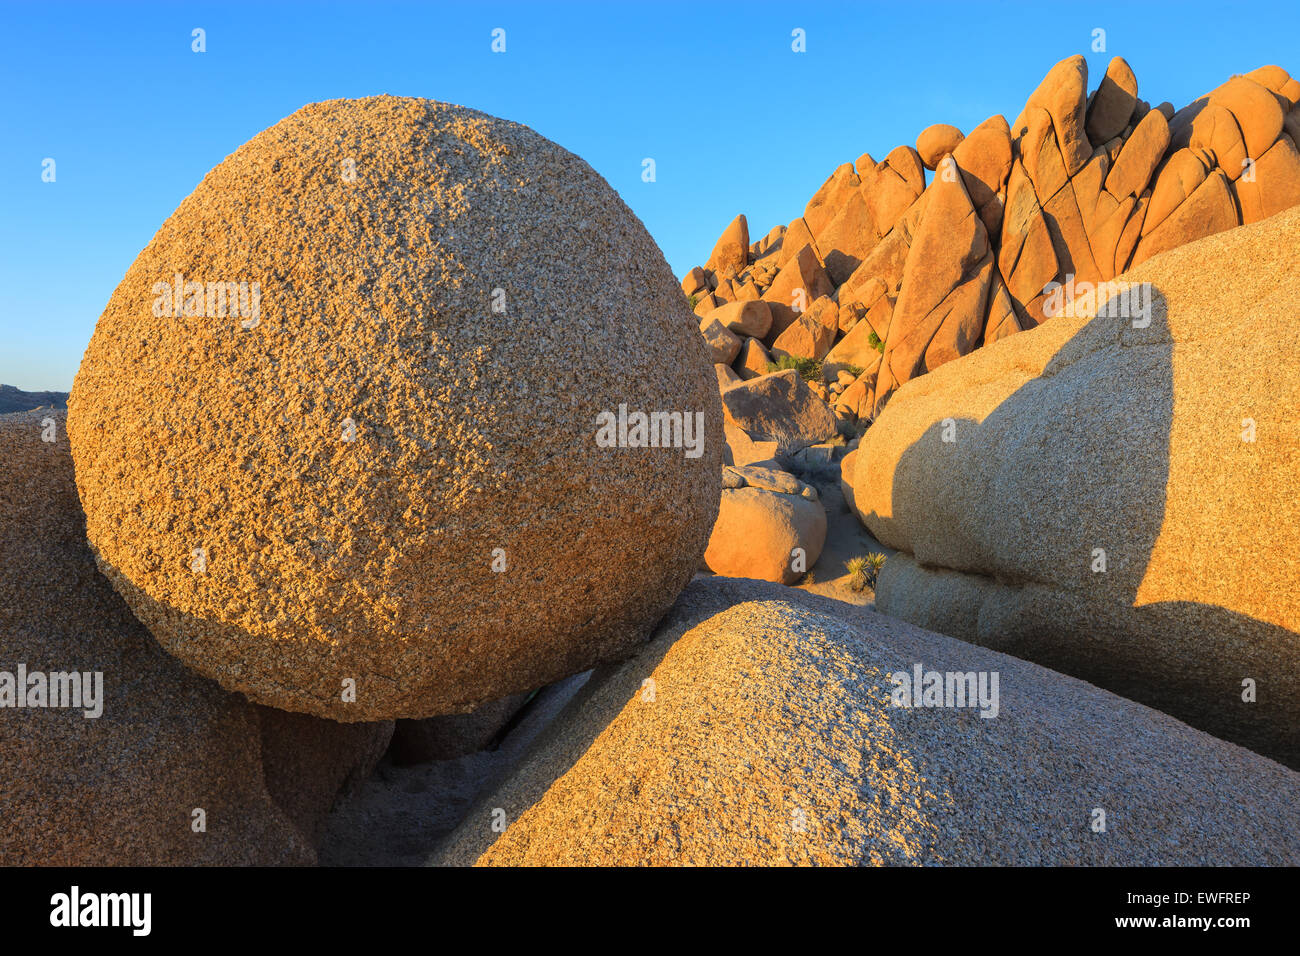 Jumbo Rocks in Joshua Tree National Park, California, USA. - Stock Image